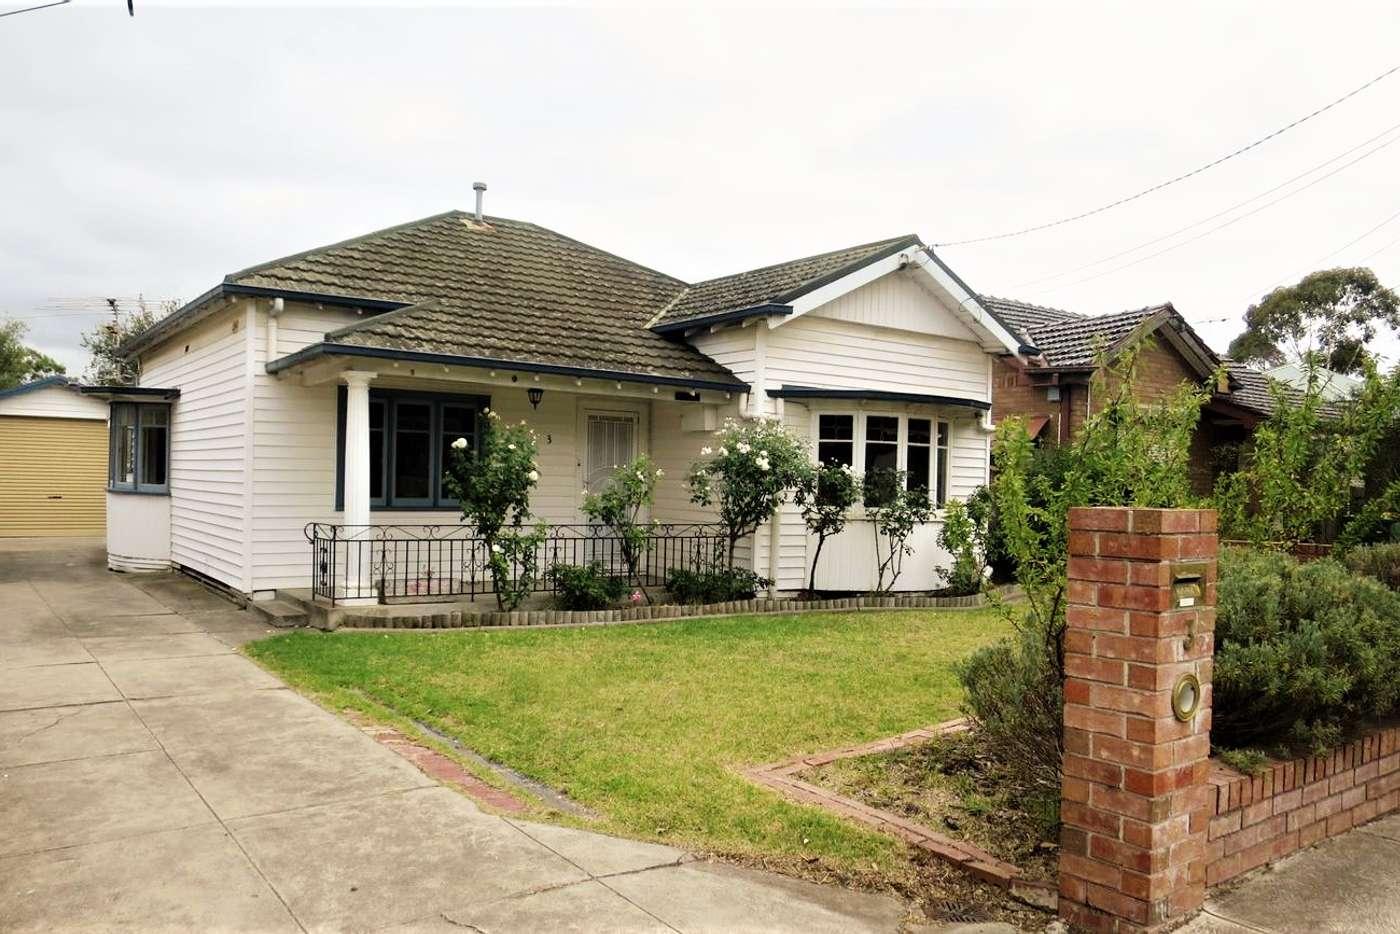 Main view of Homely house listing, 3 Devon Street, Preston VIC 3072